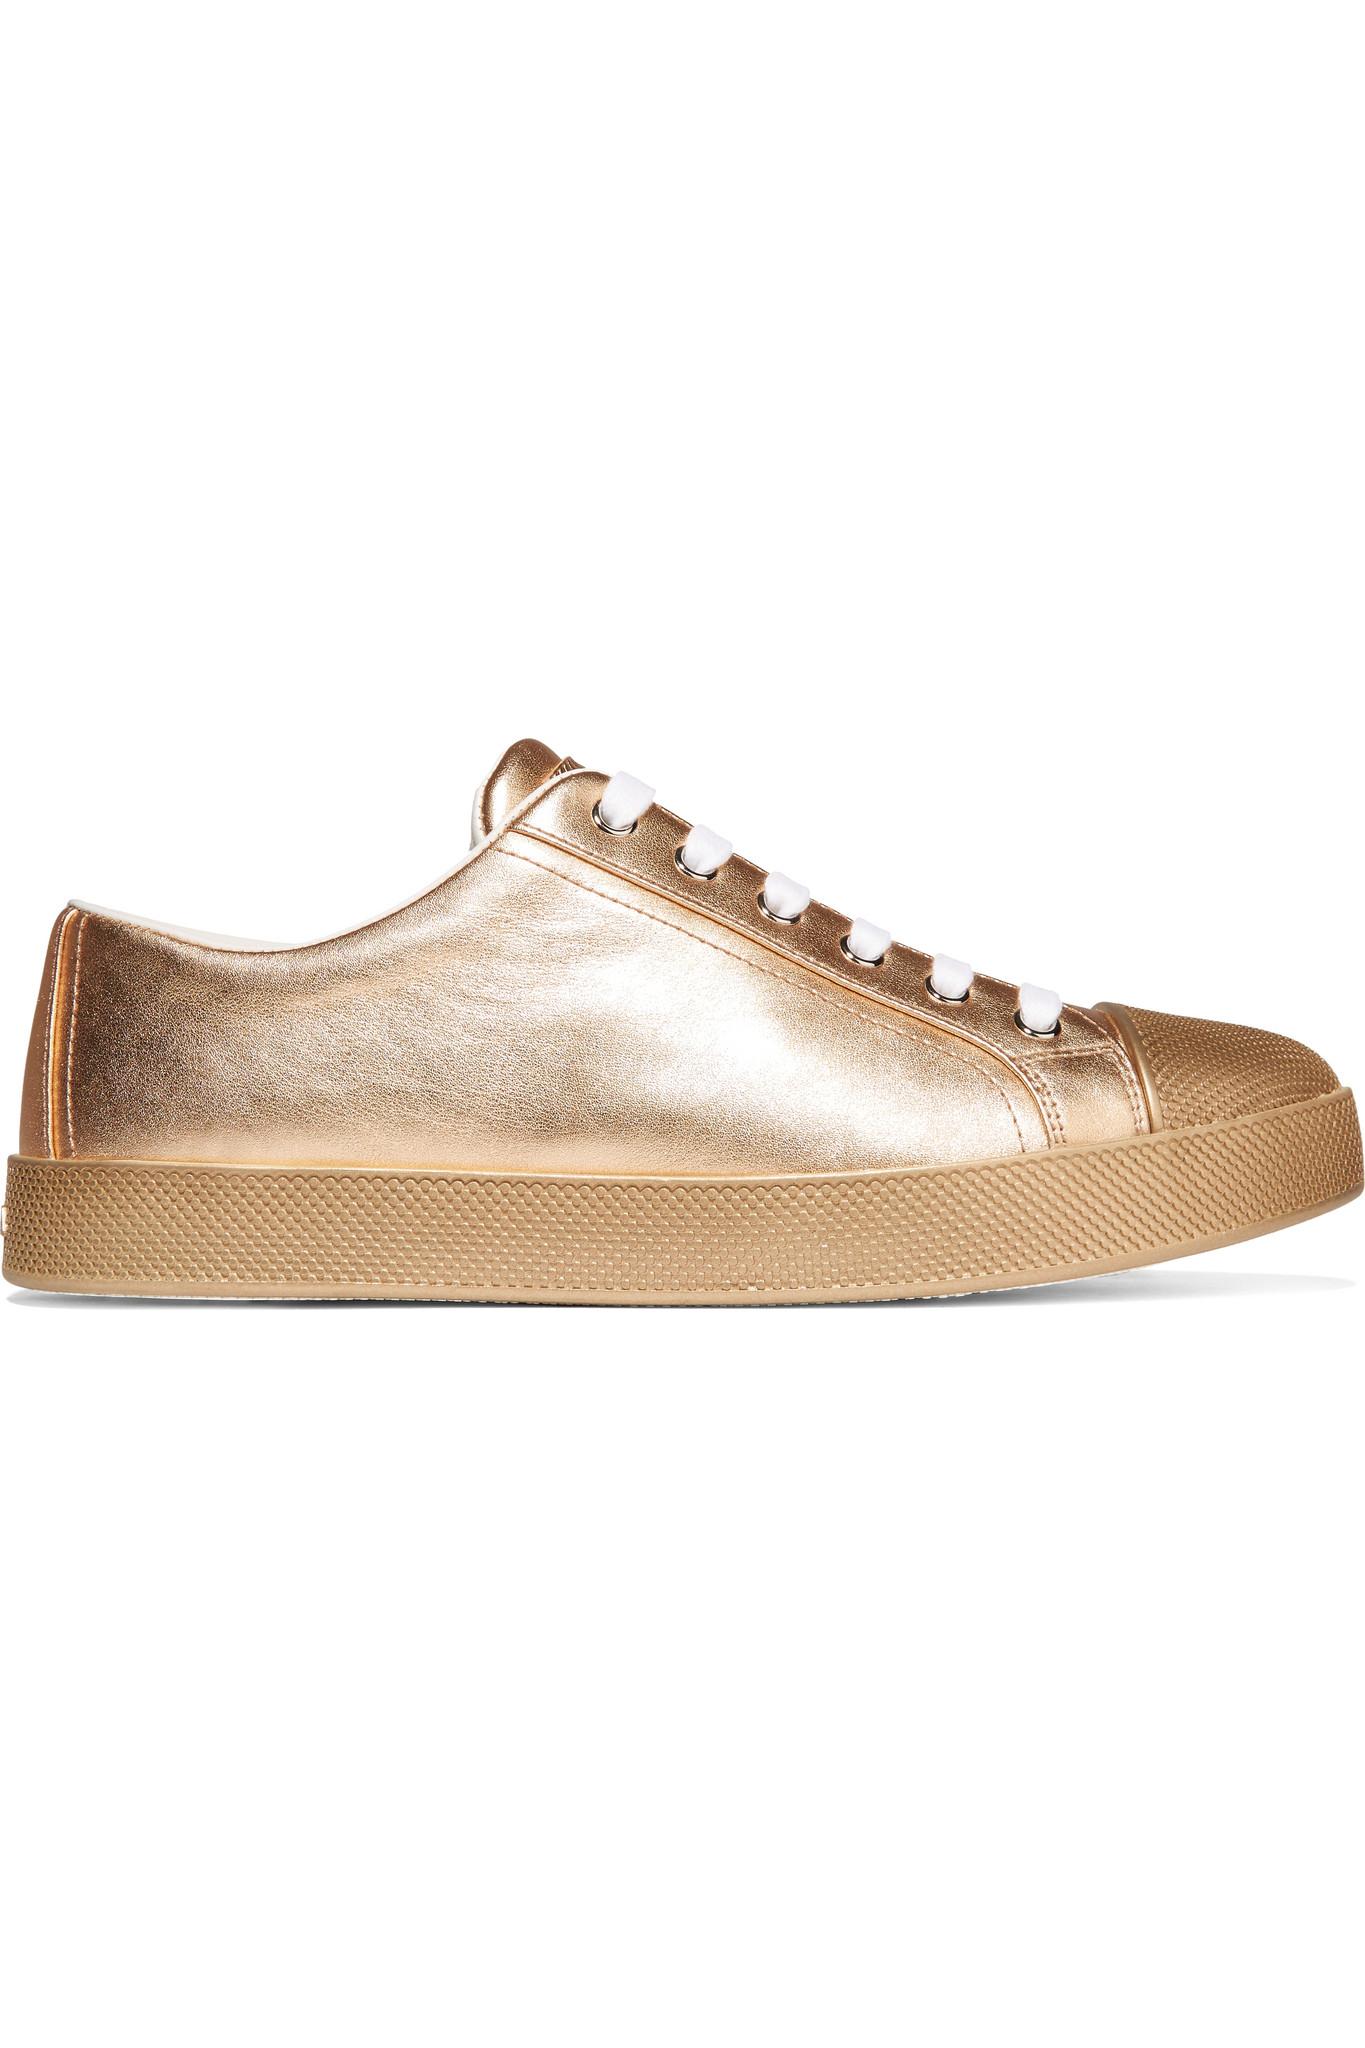 prada metallic textured leather trainers in metallic lyst